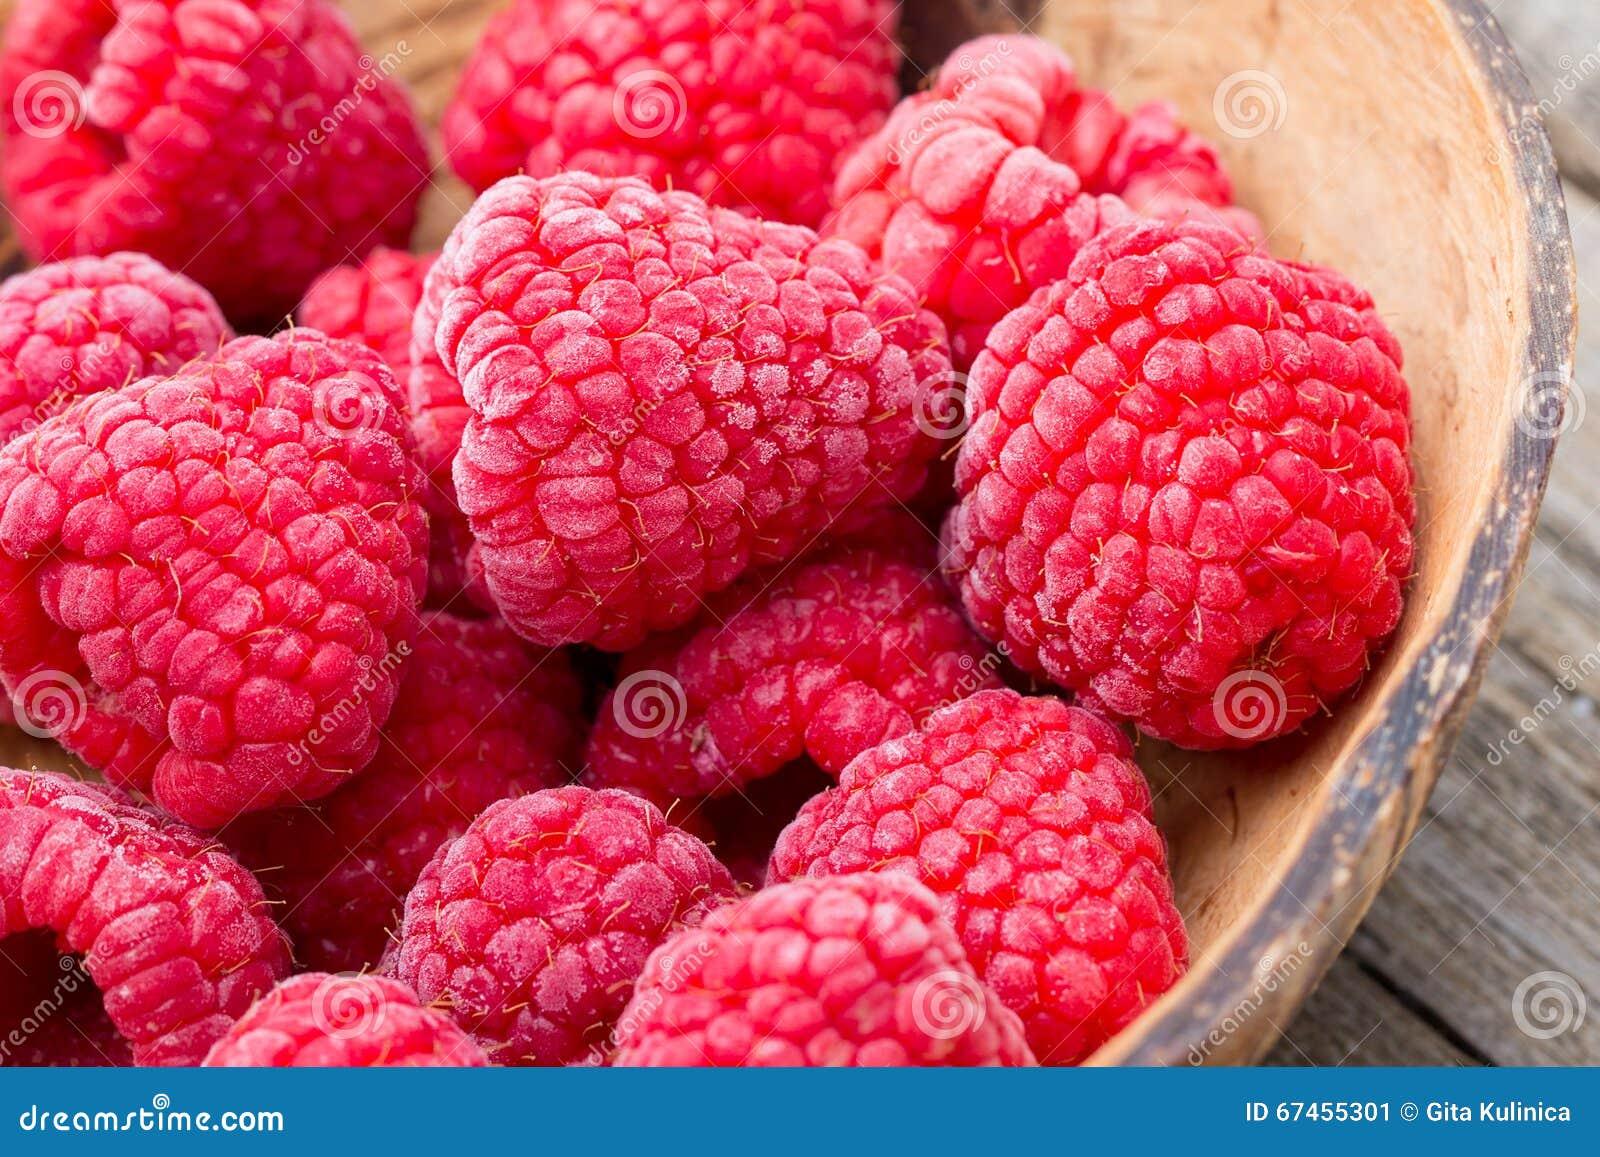 Frozen raspberries on wooden background.